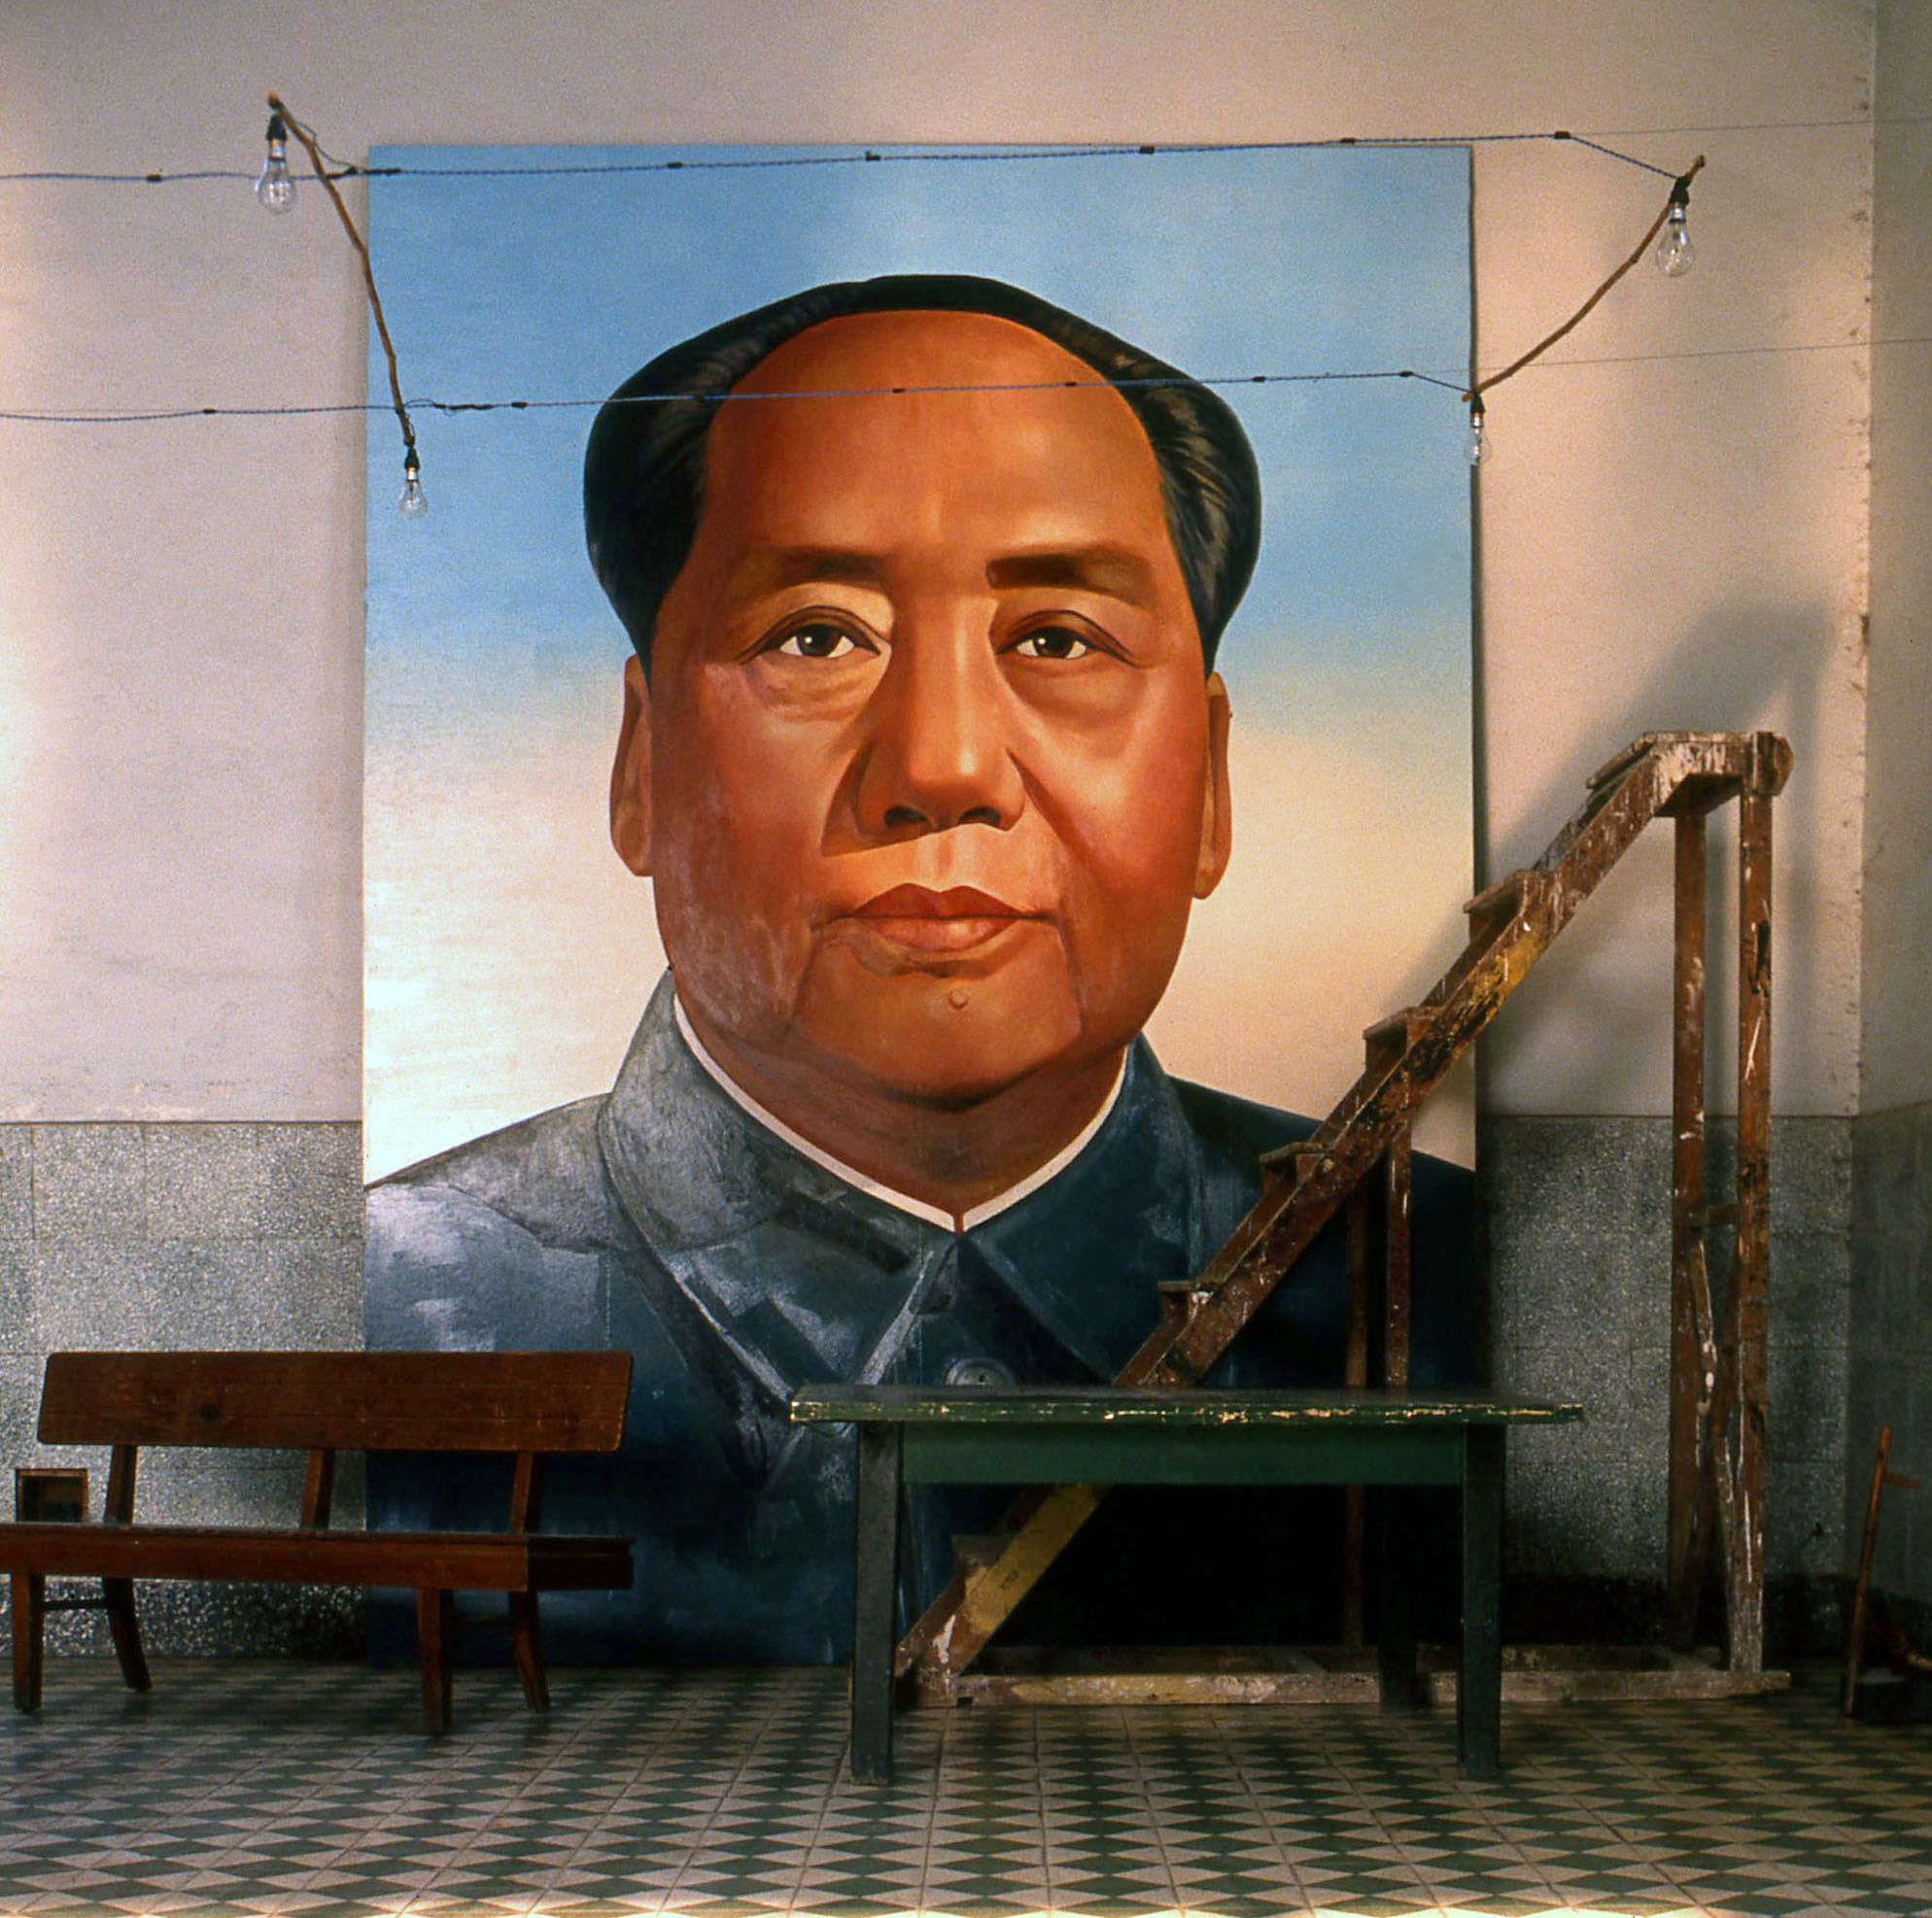 Mao Portrait Shao Shan Train Station Hi Res.jpg